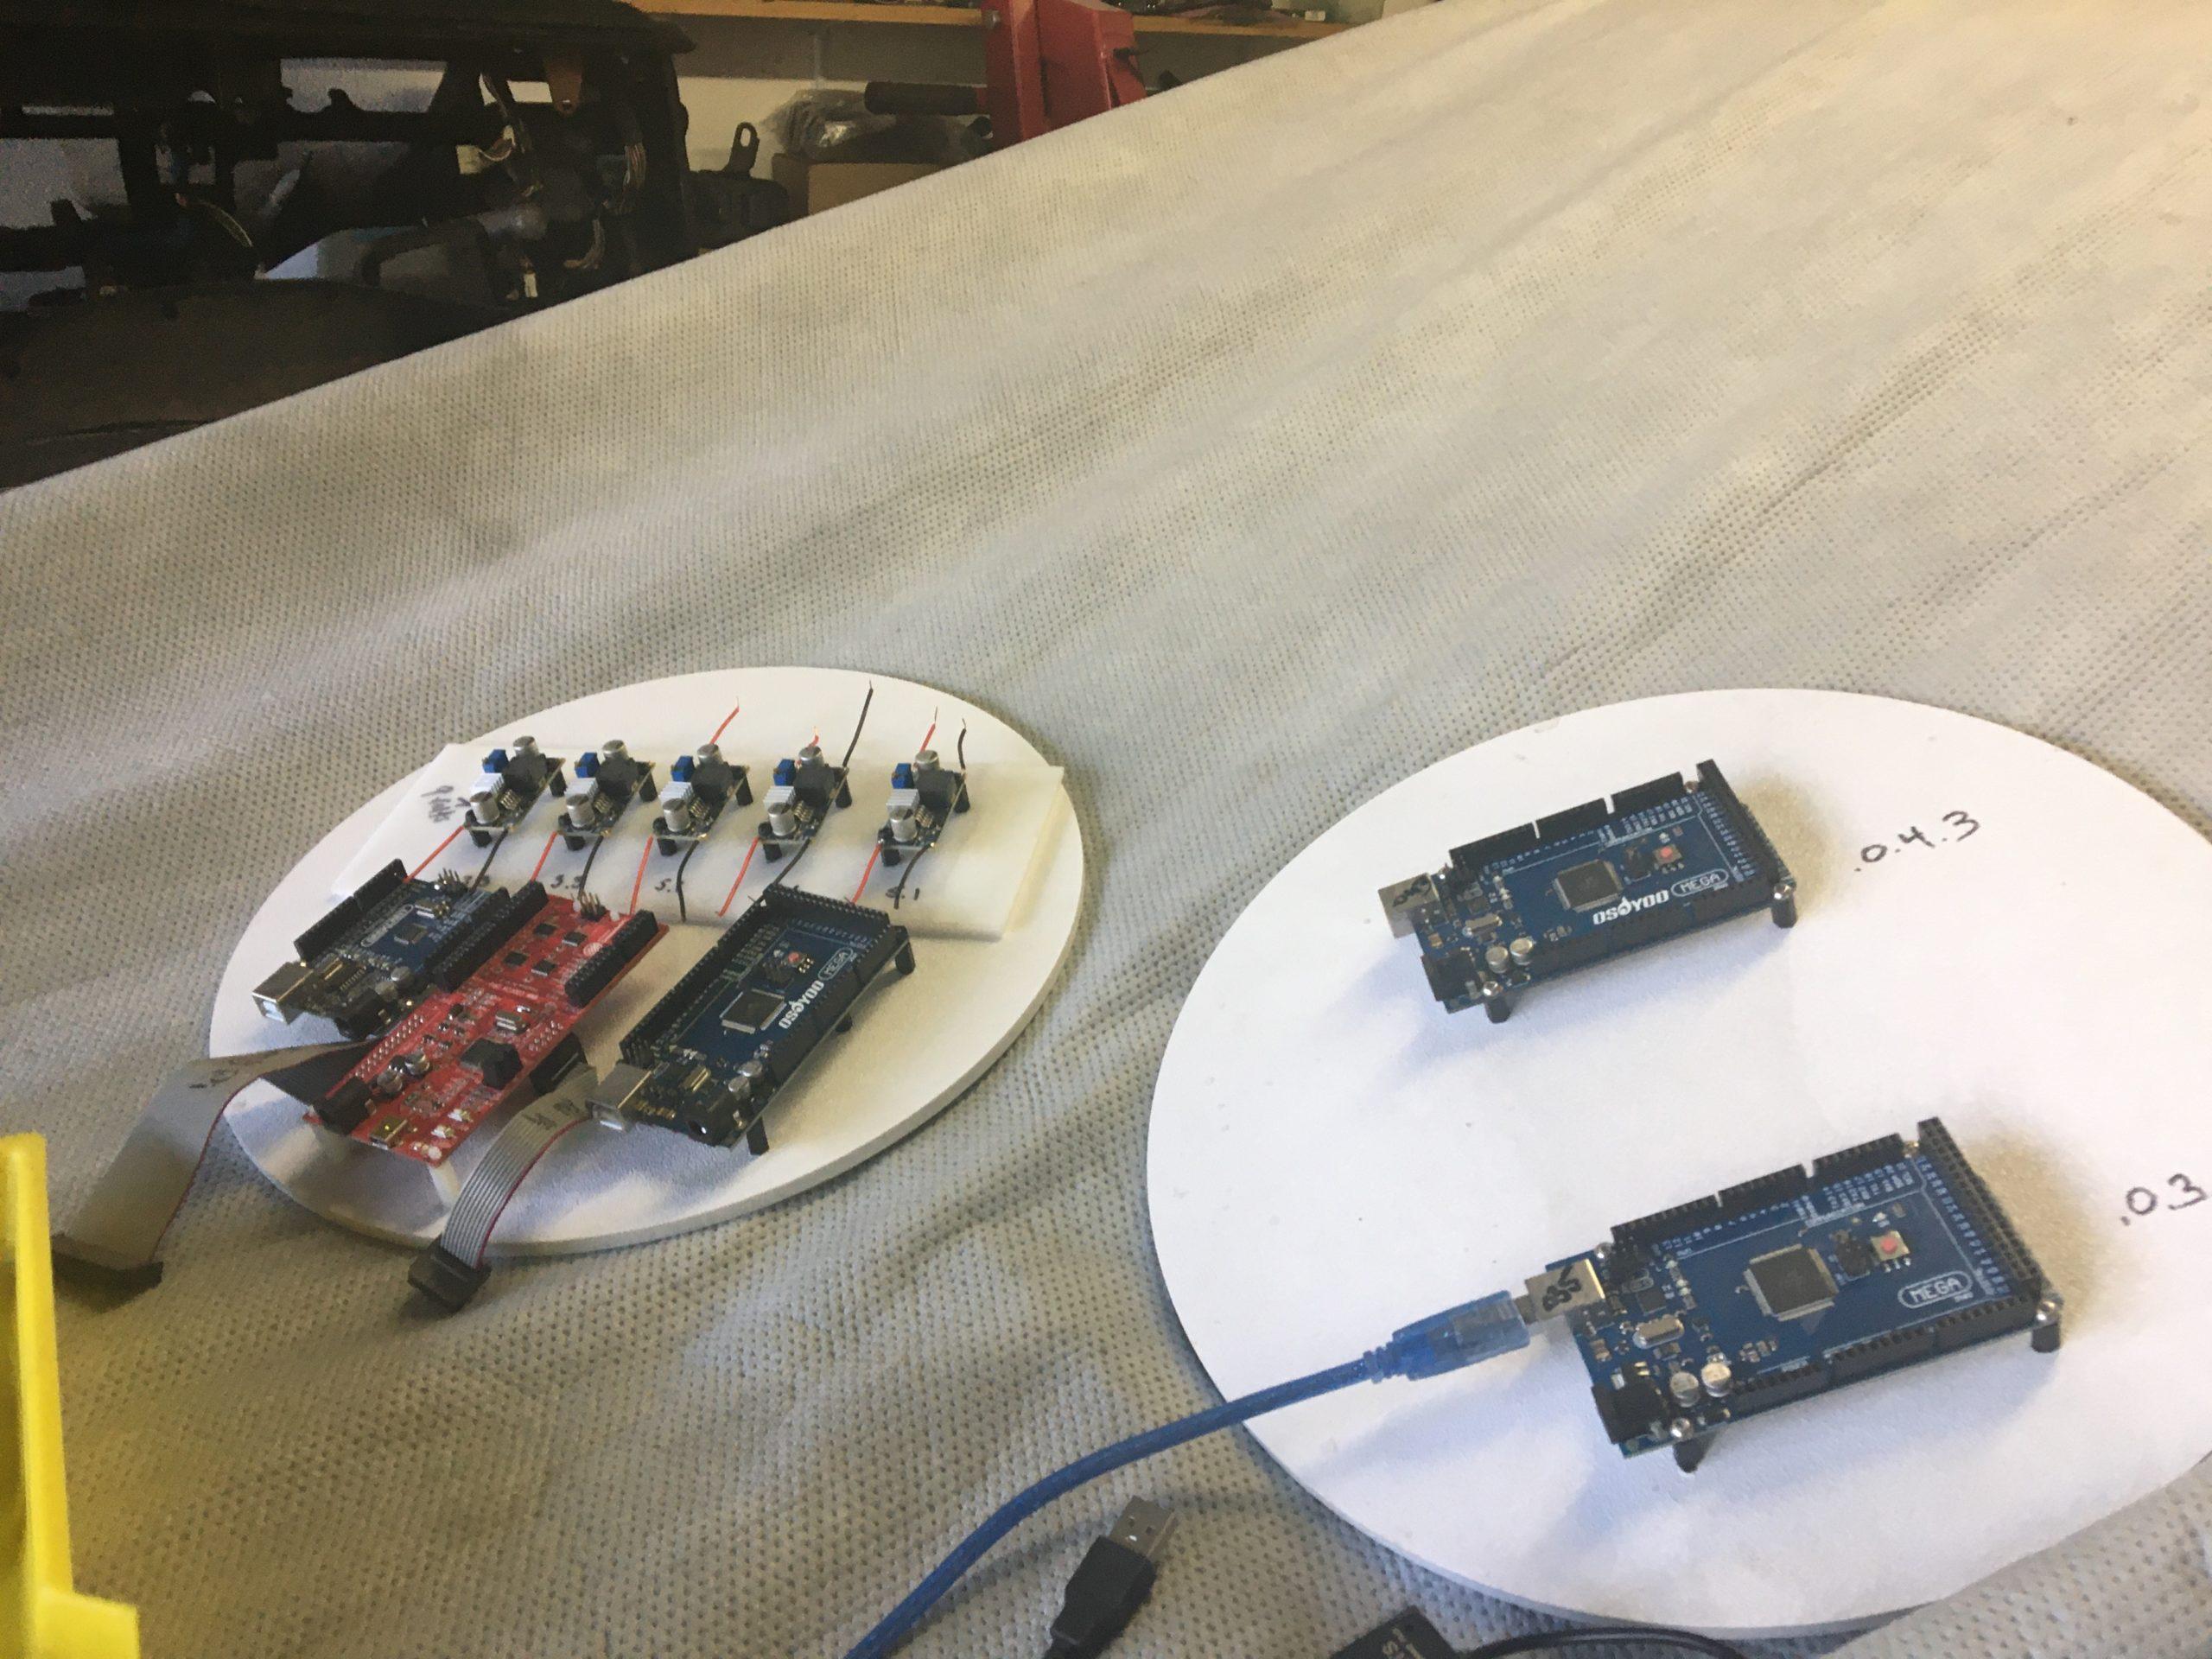 3 Megas, an Uno and a Bridge + Buck Converters